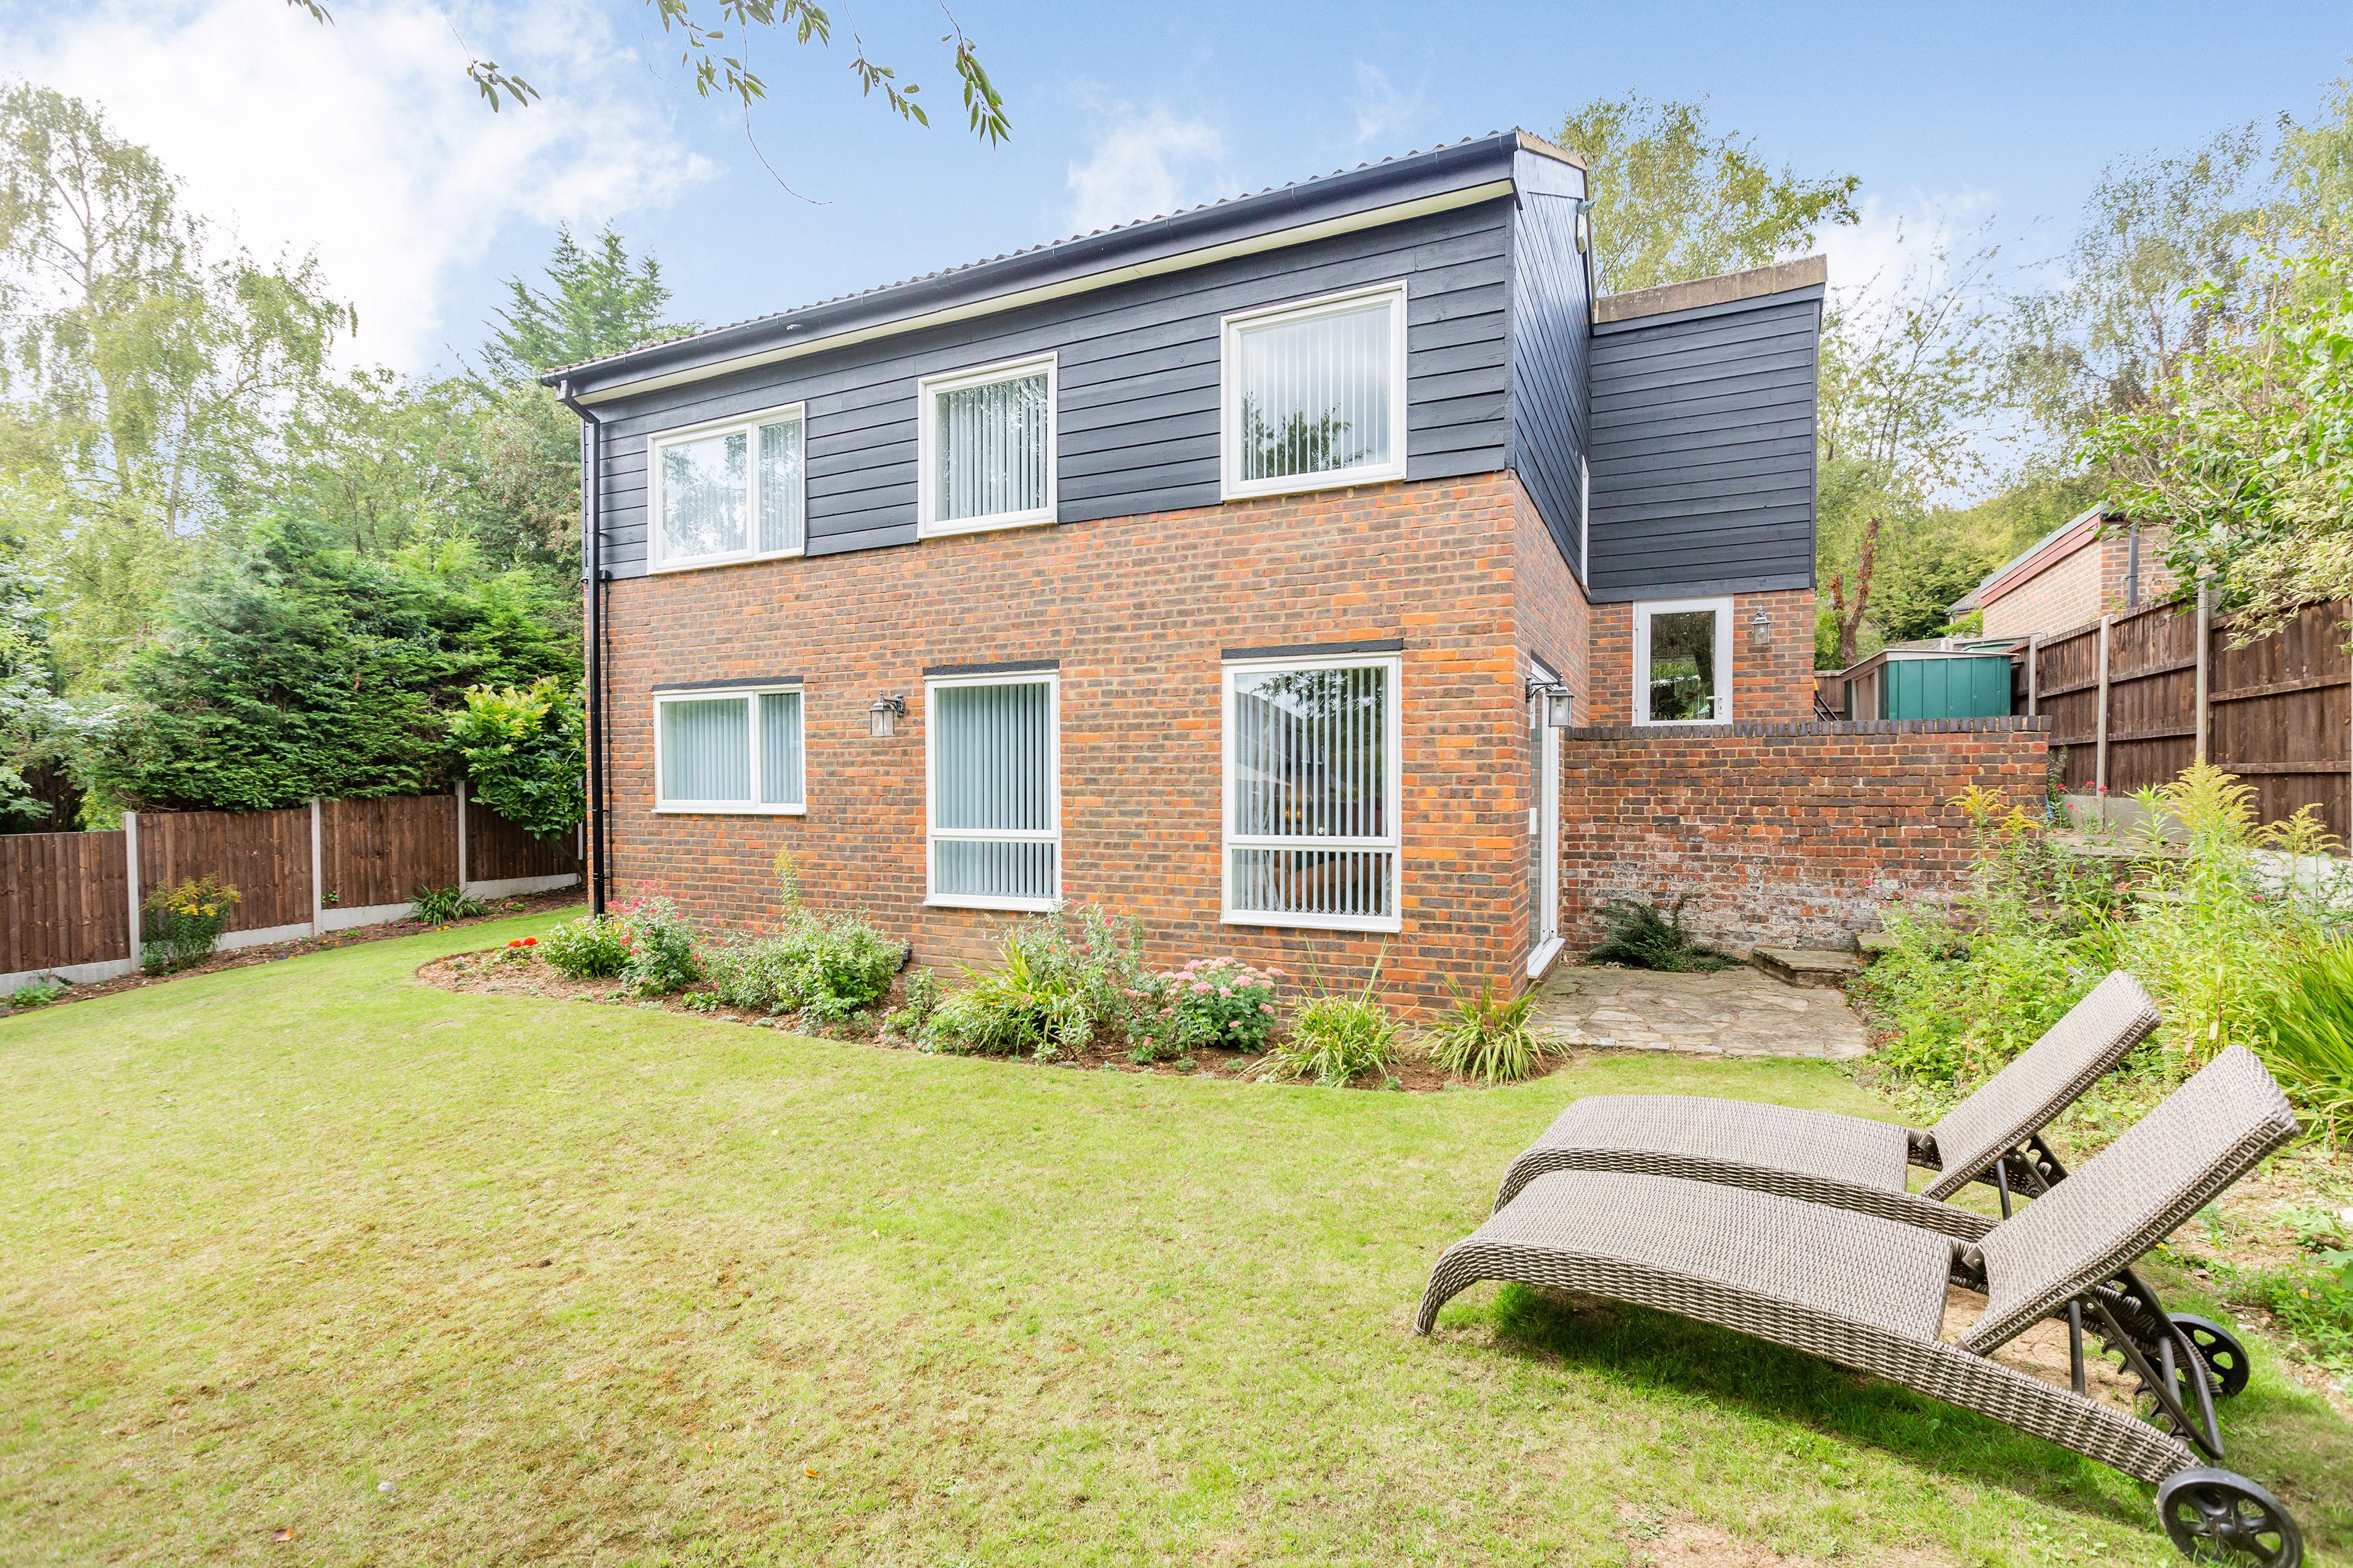 New Ash Green - OIEO £630,000